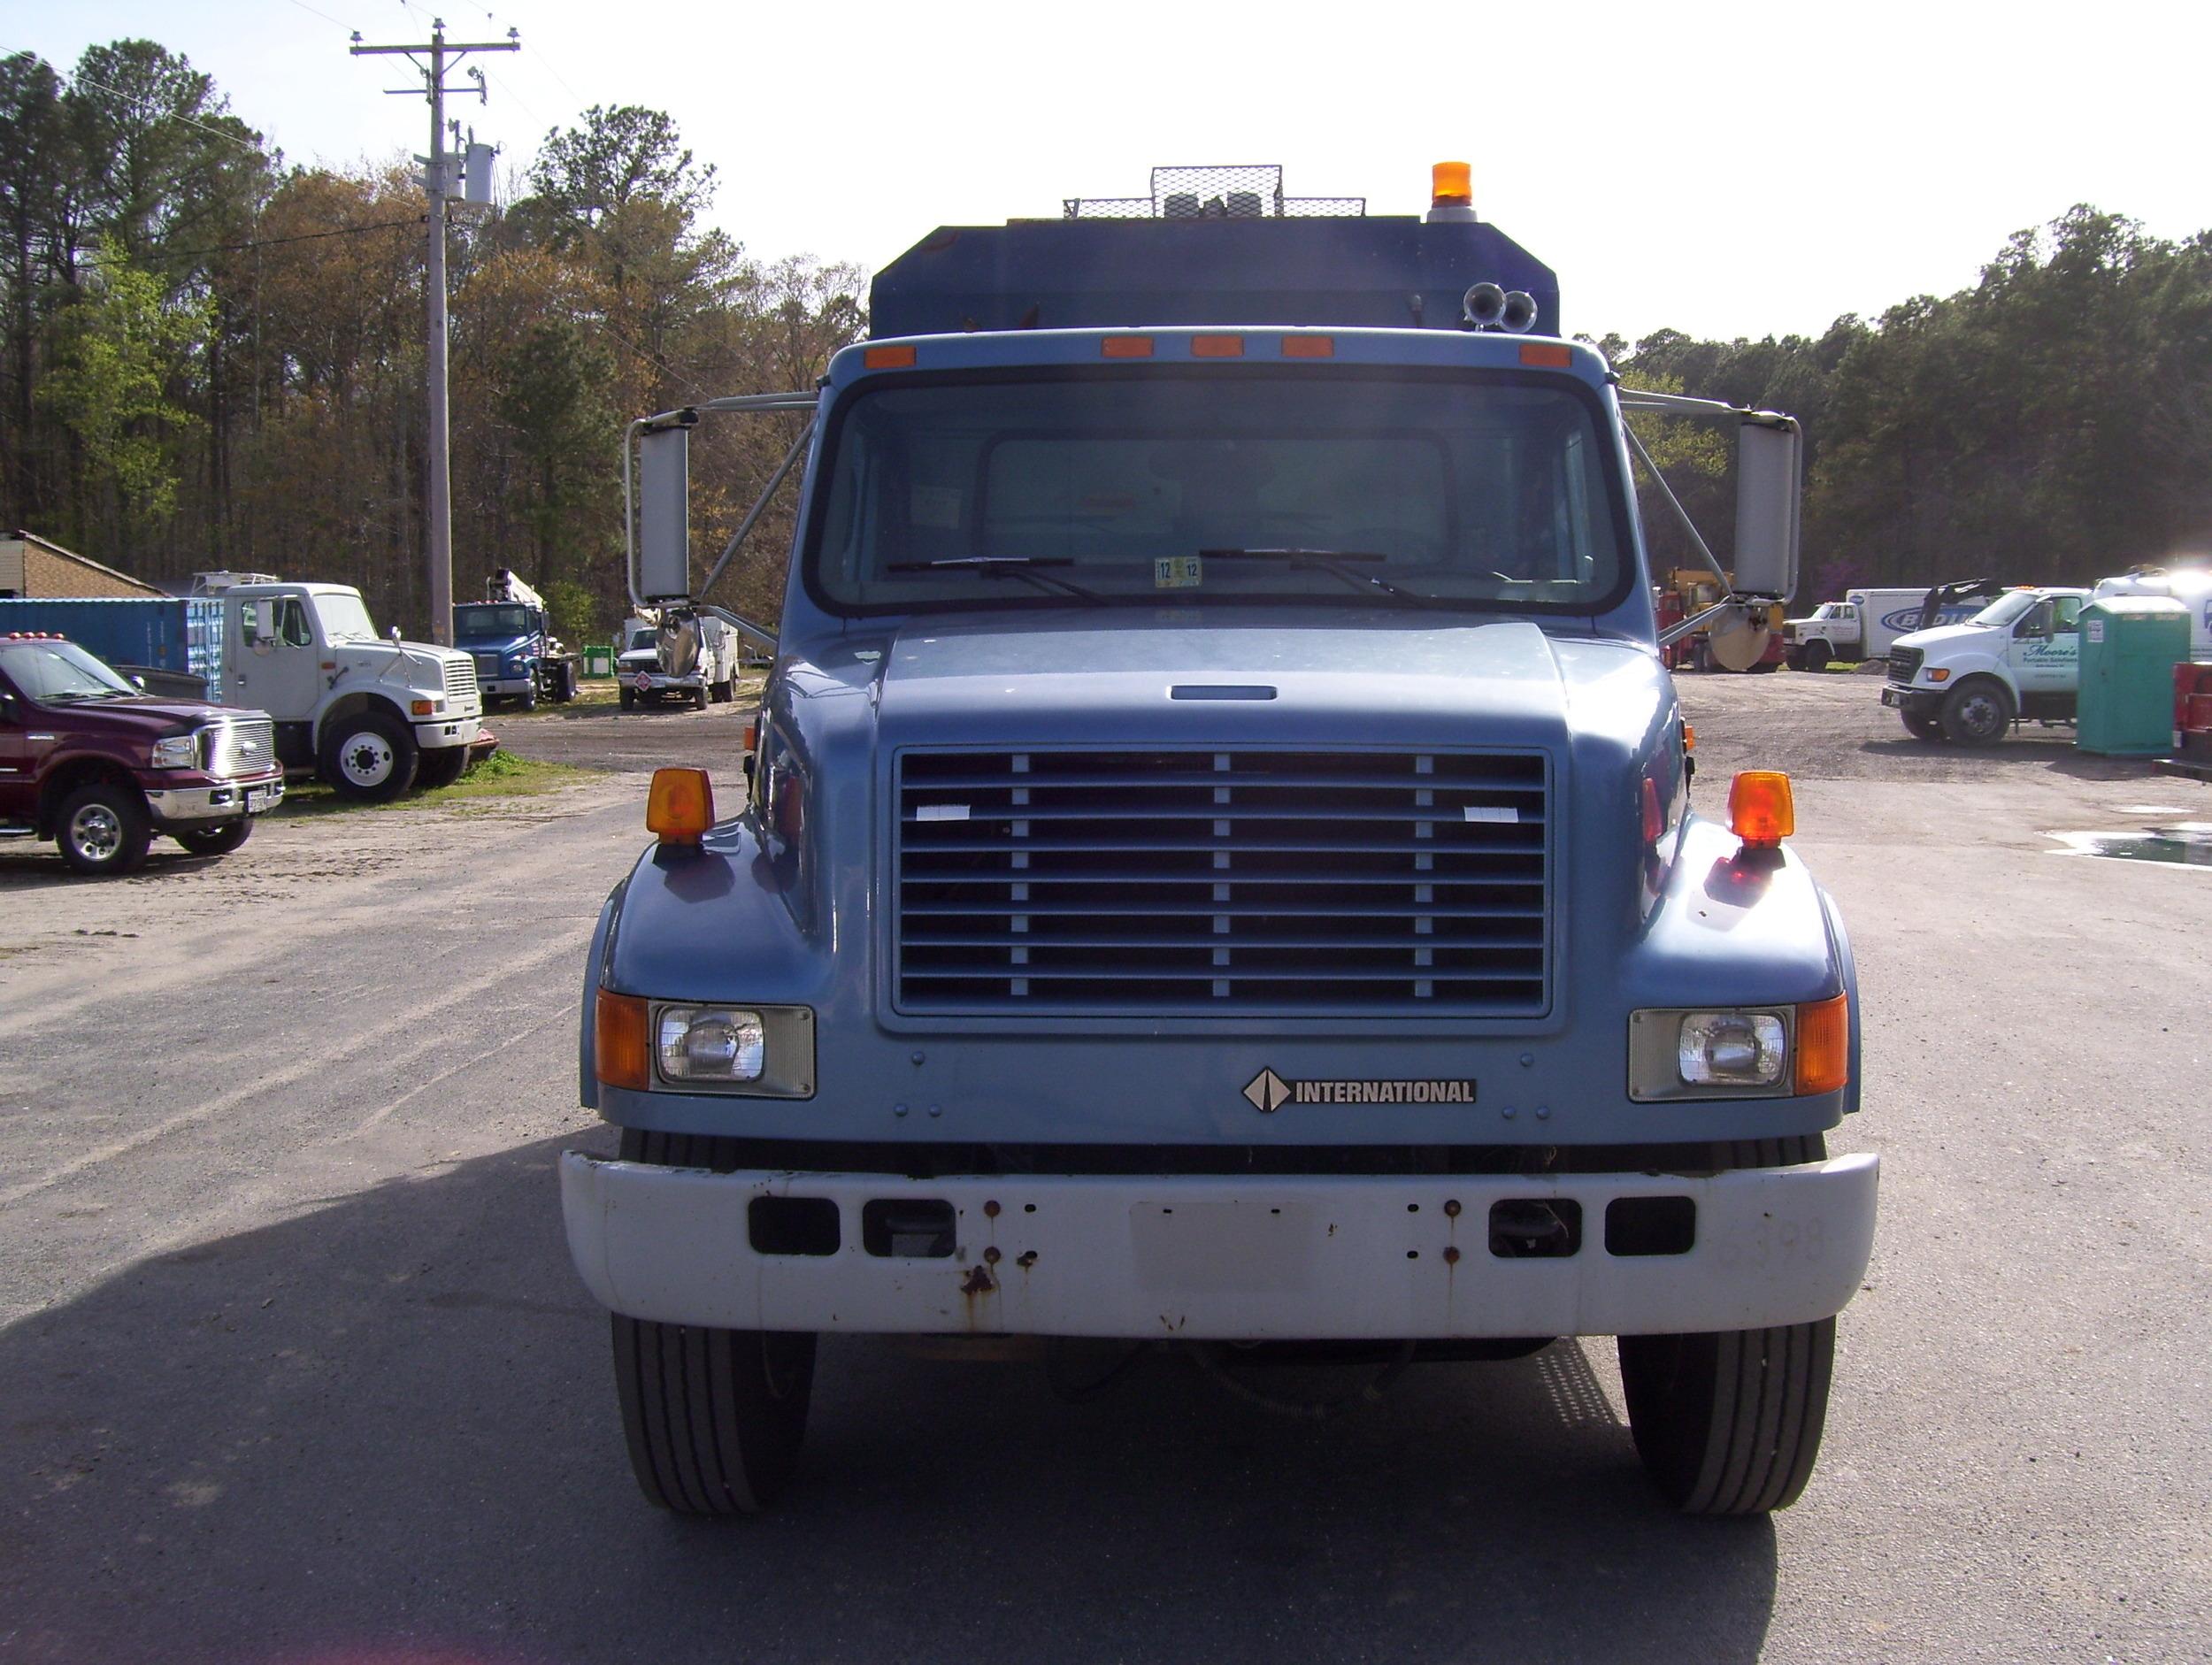 99 International Service Truck 003.jpg